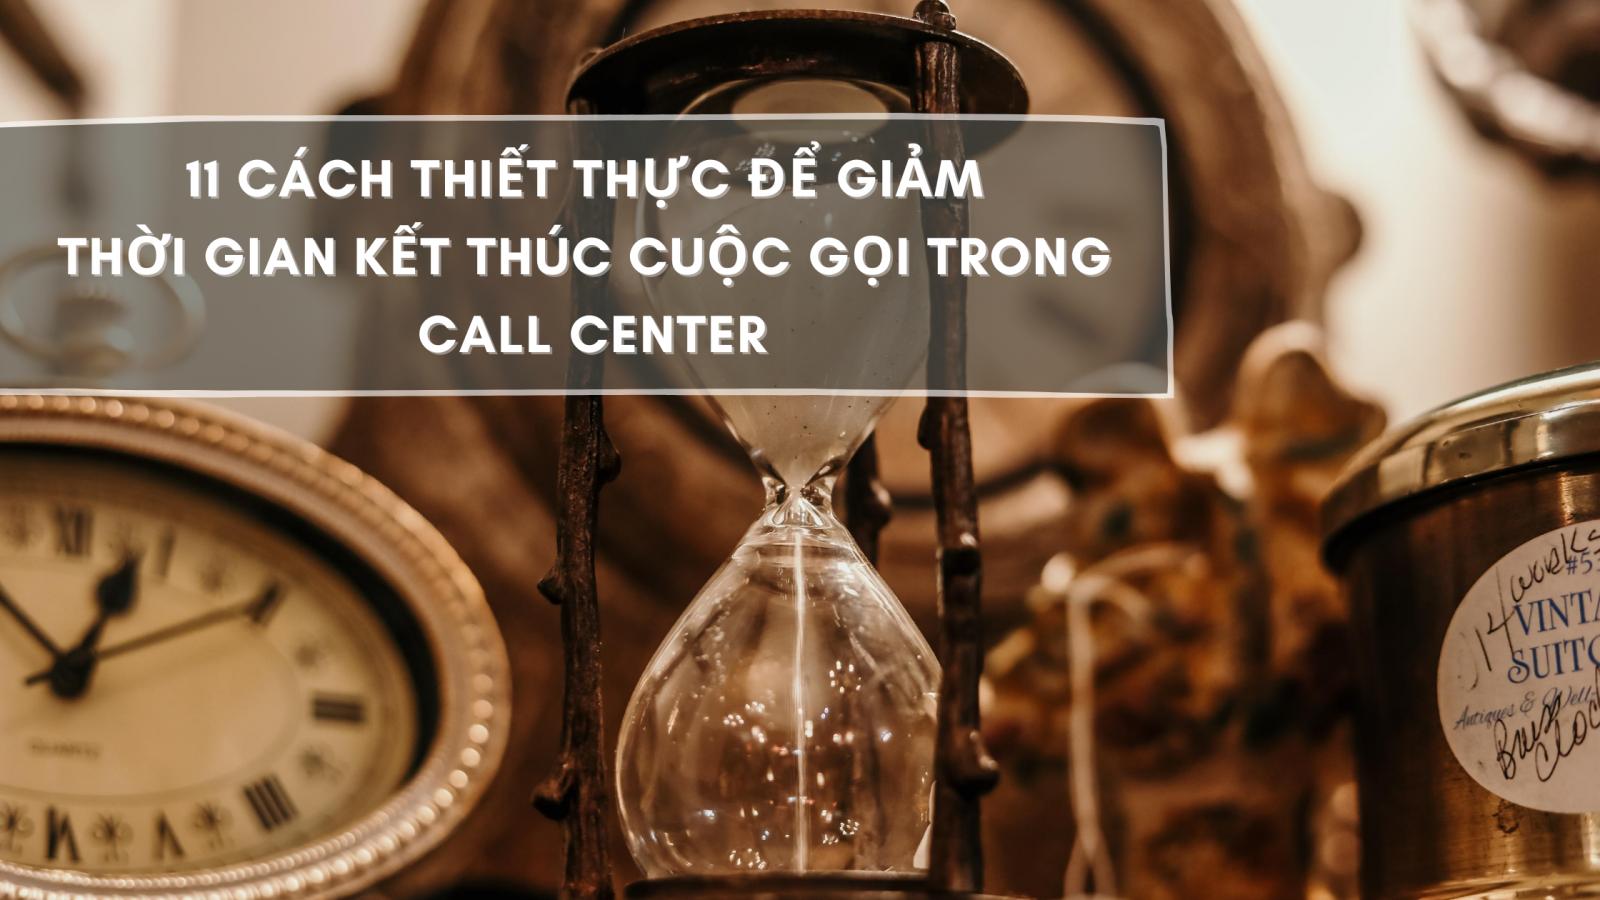 11-cach-thiet-thuc-de-giam-thoi-gian-ket-thuc-cuoc-goi-trong-call-center